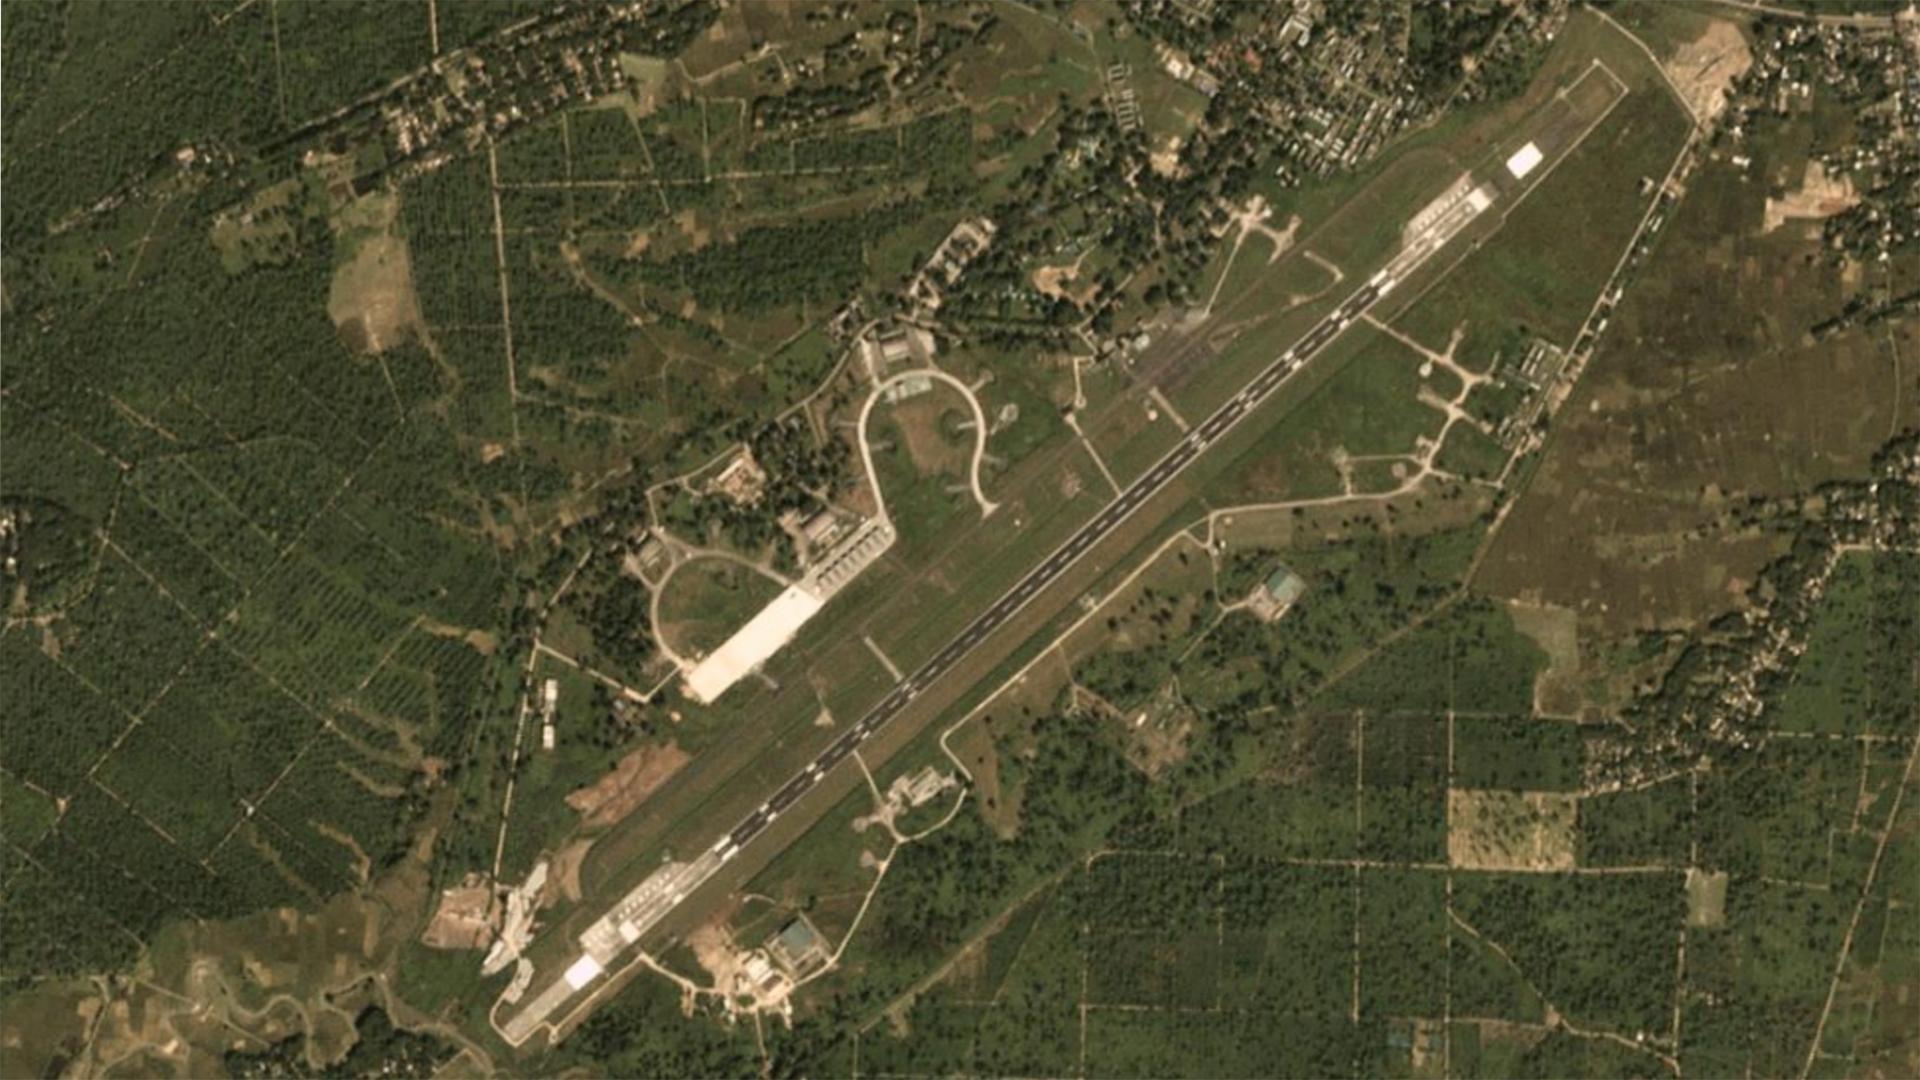 Satellite image of Chabua Air Force Station on October 27, 2018